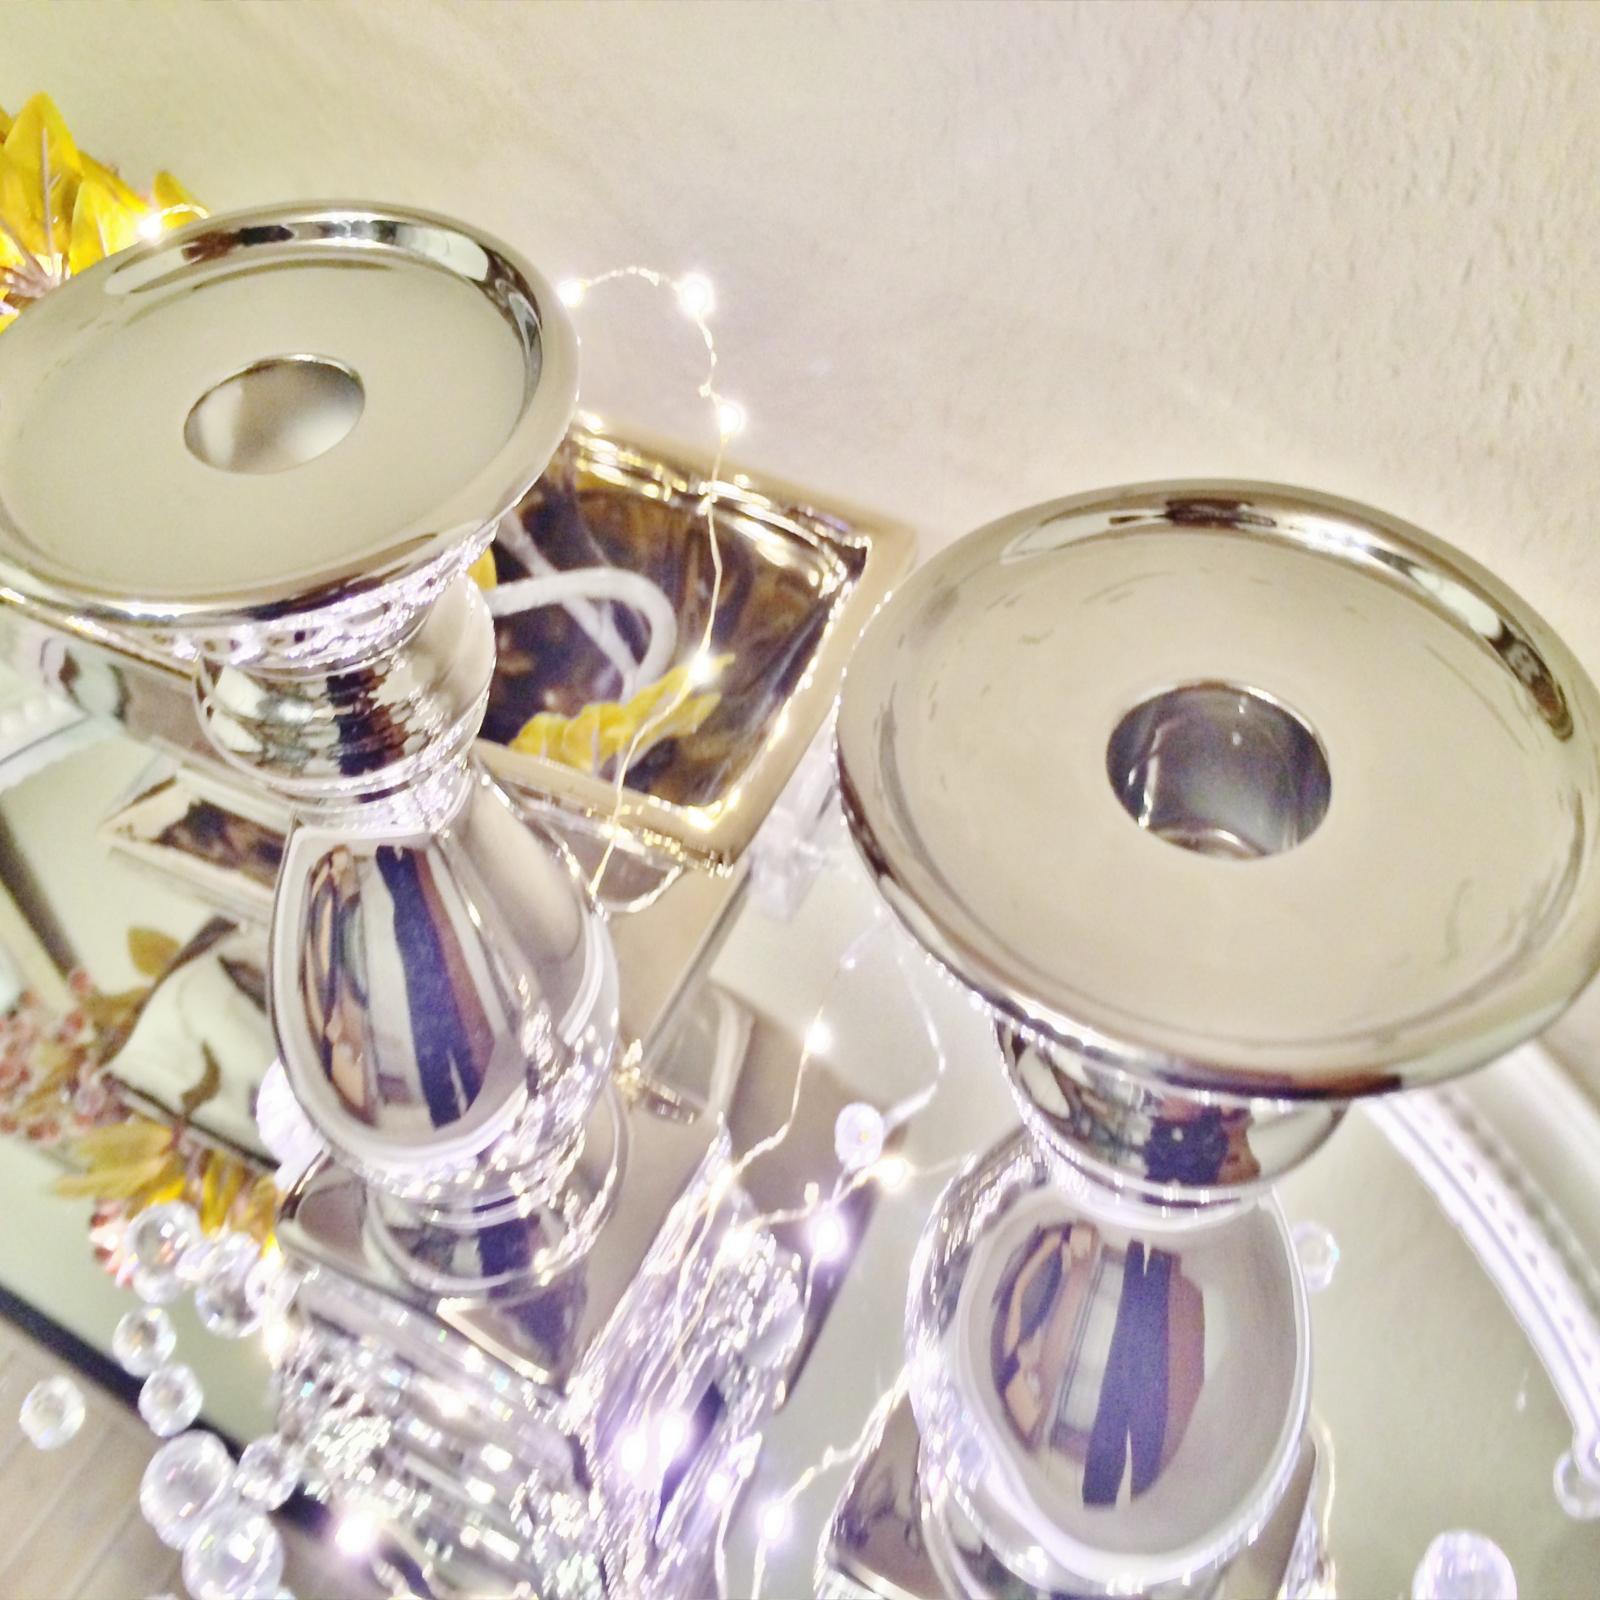 Katy porta candele candela decorazione ceramica argento for Decorazione ceramica